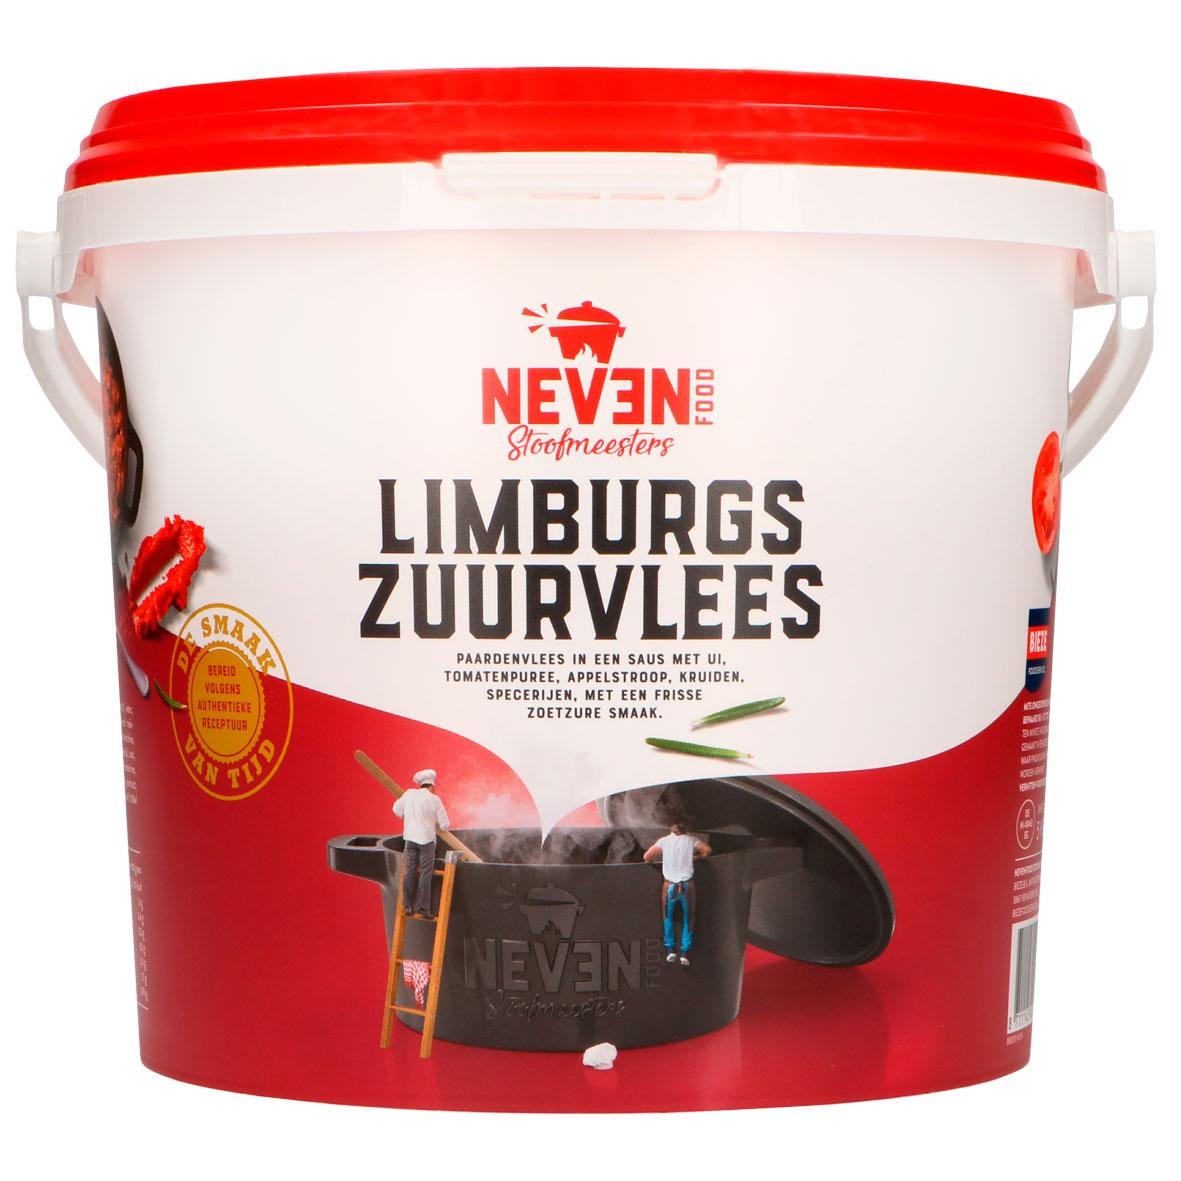 Neven Food Limburgs zuurvlees paard normaal